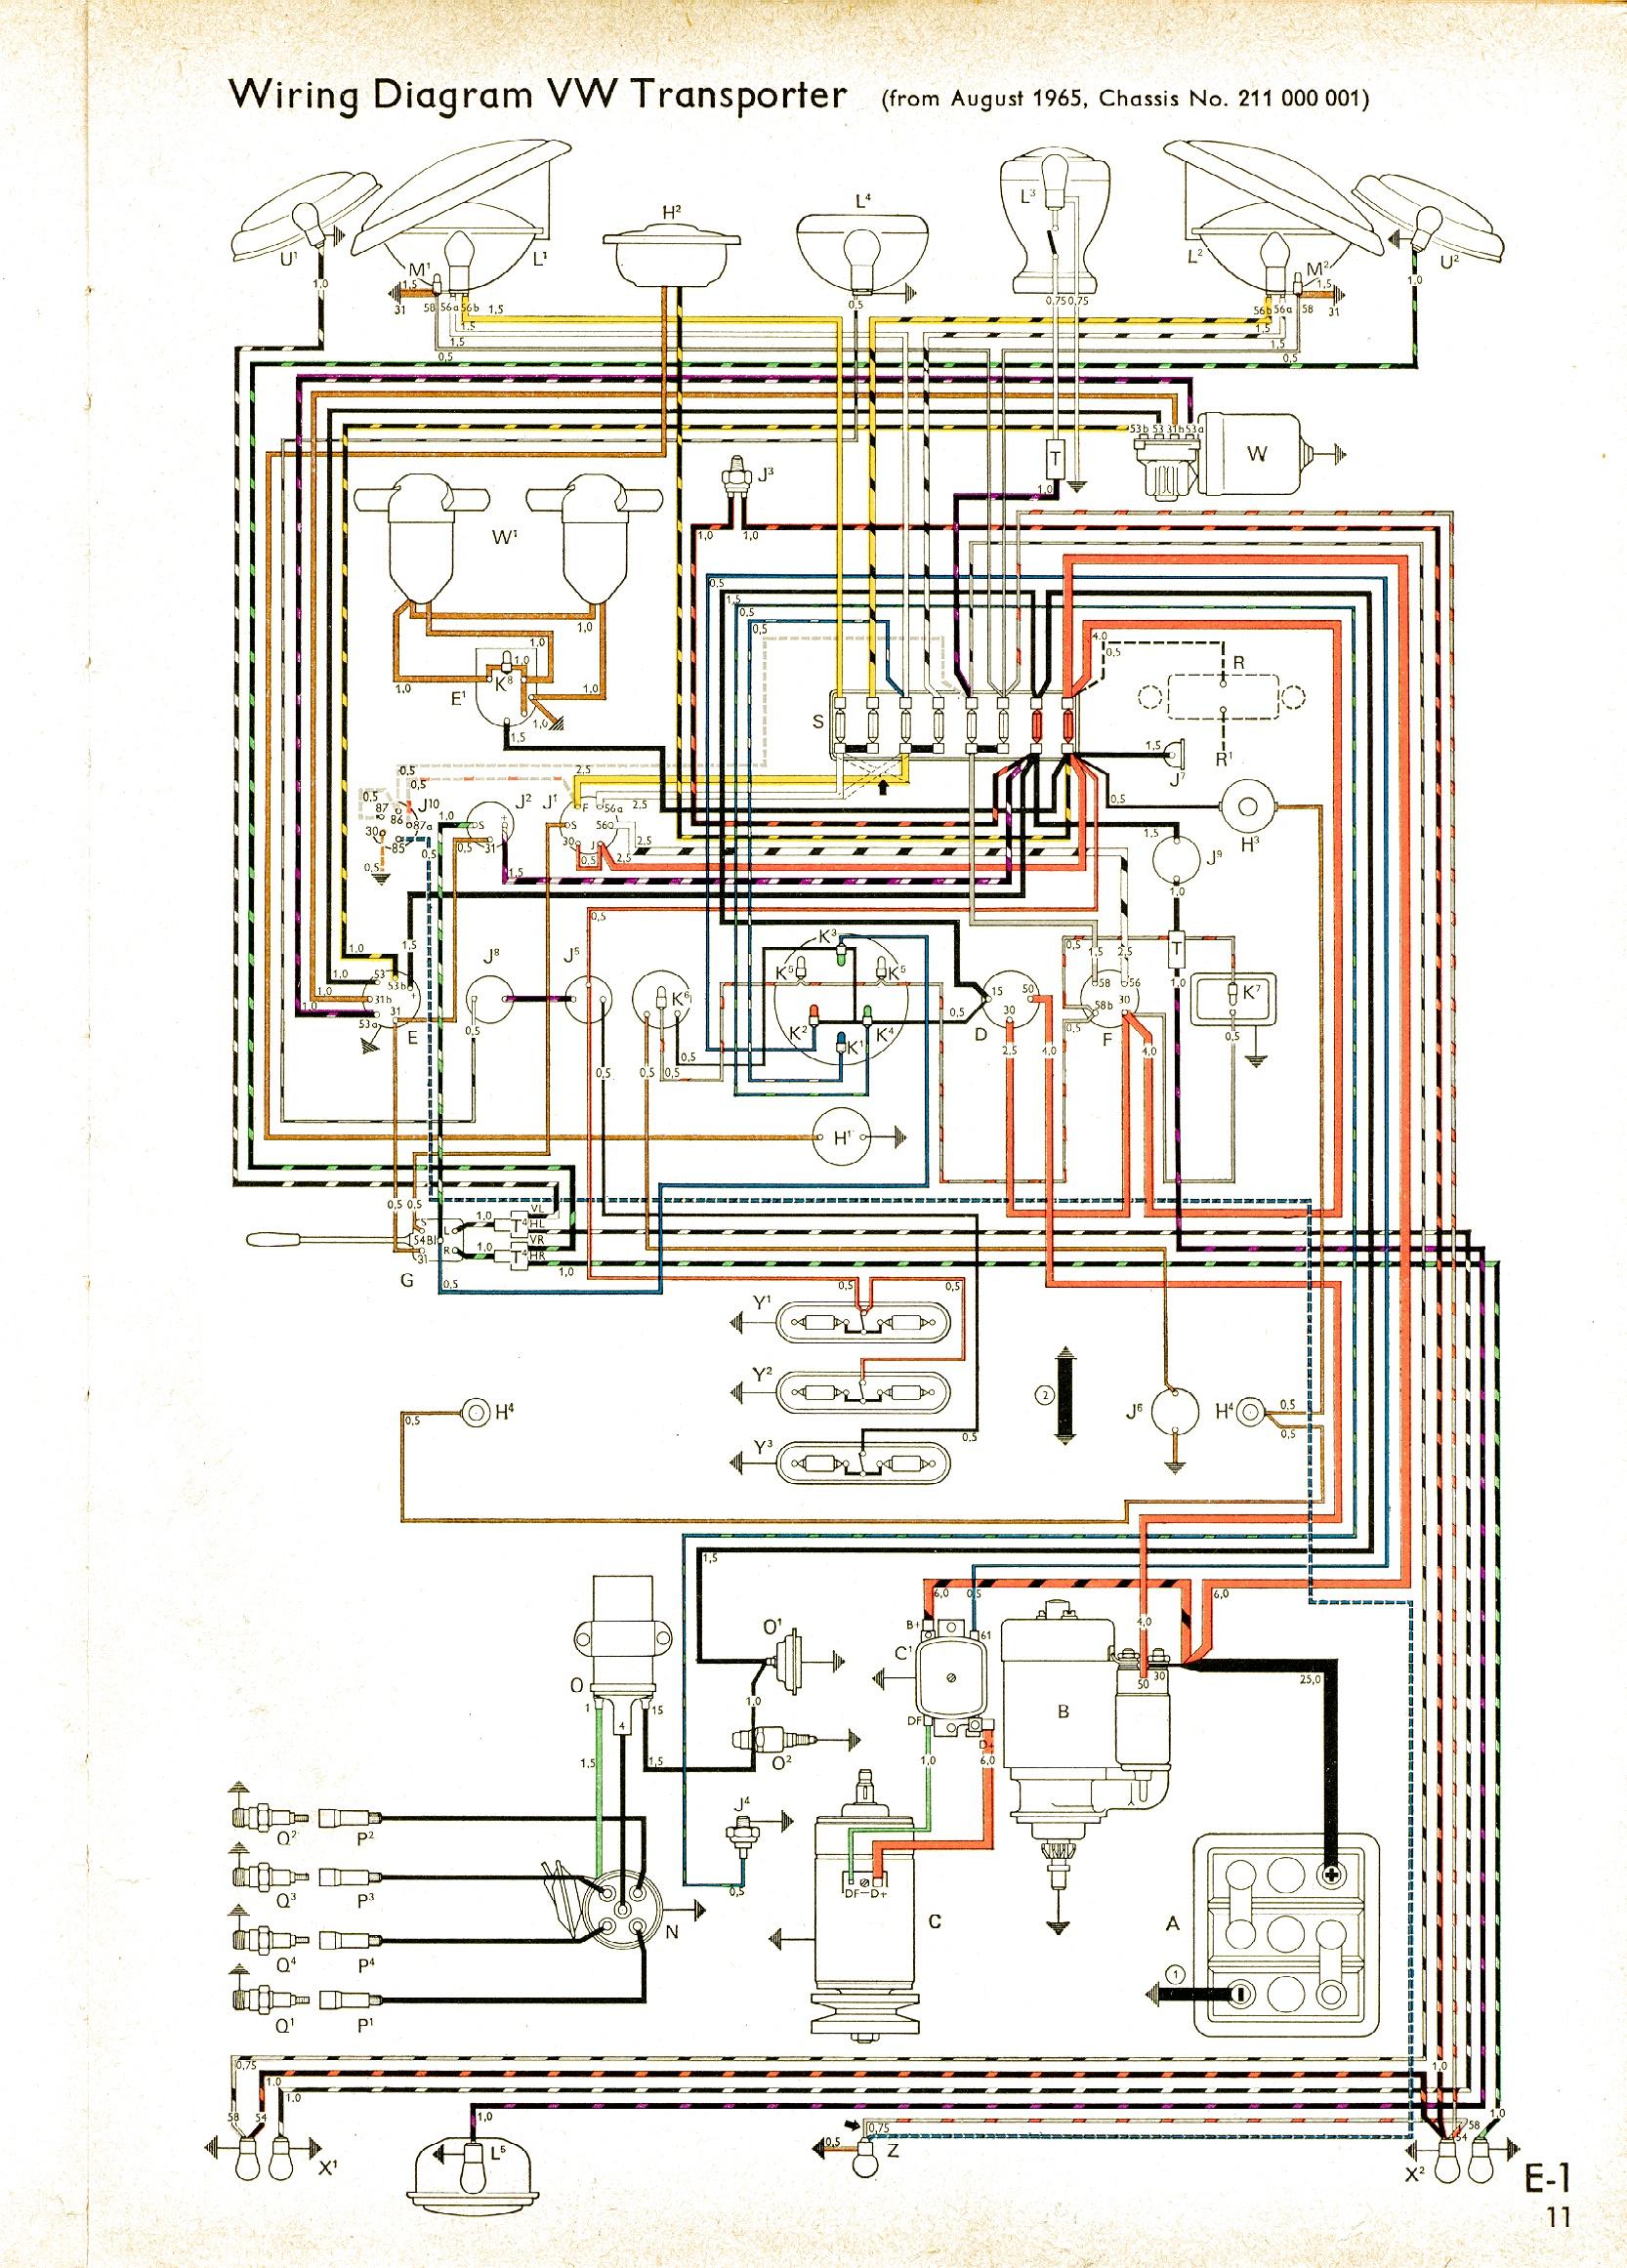 Groovy Vw Type 2 Wiring Diagram Wiring Library Wiring Cloud Picalendutblikvittorg